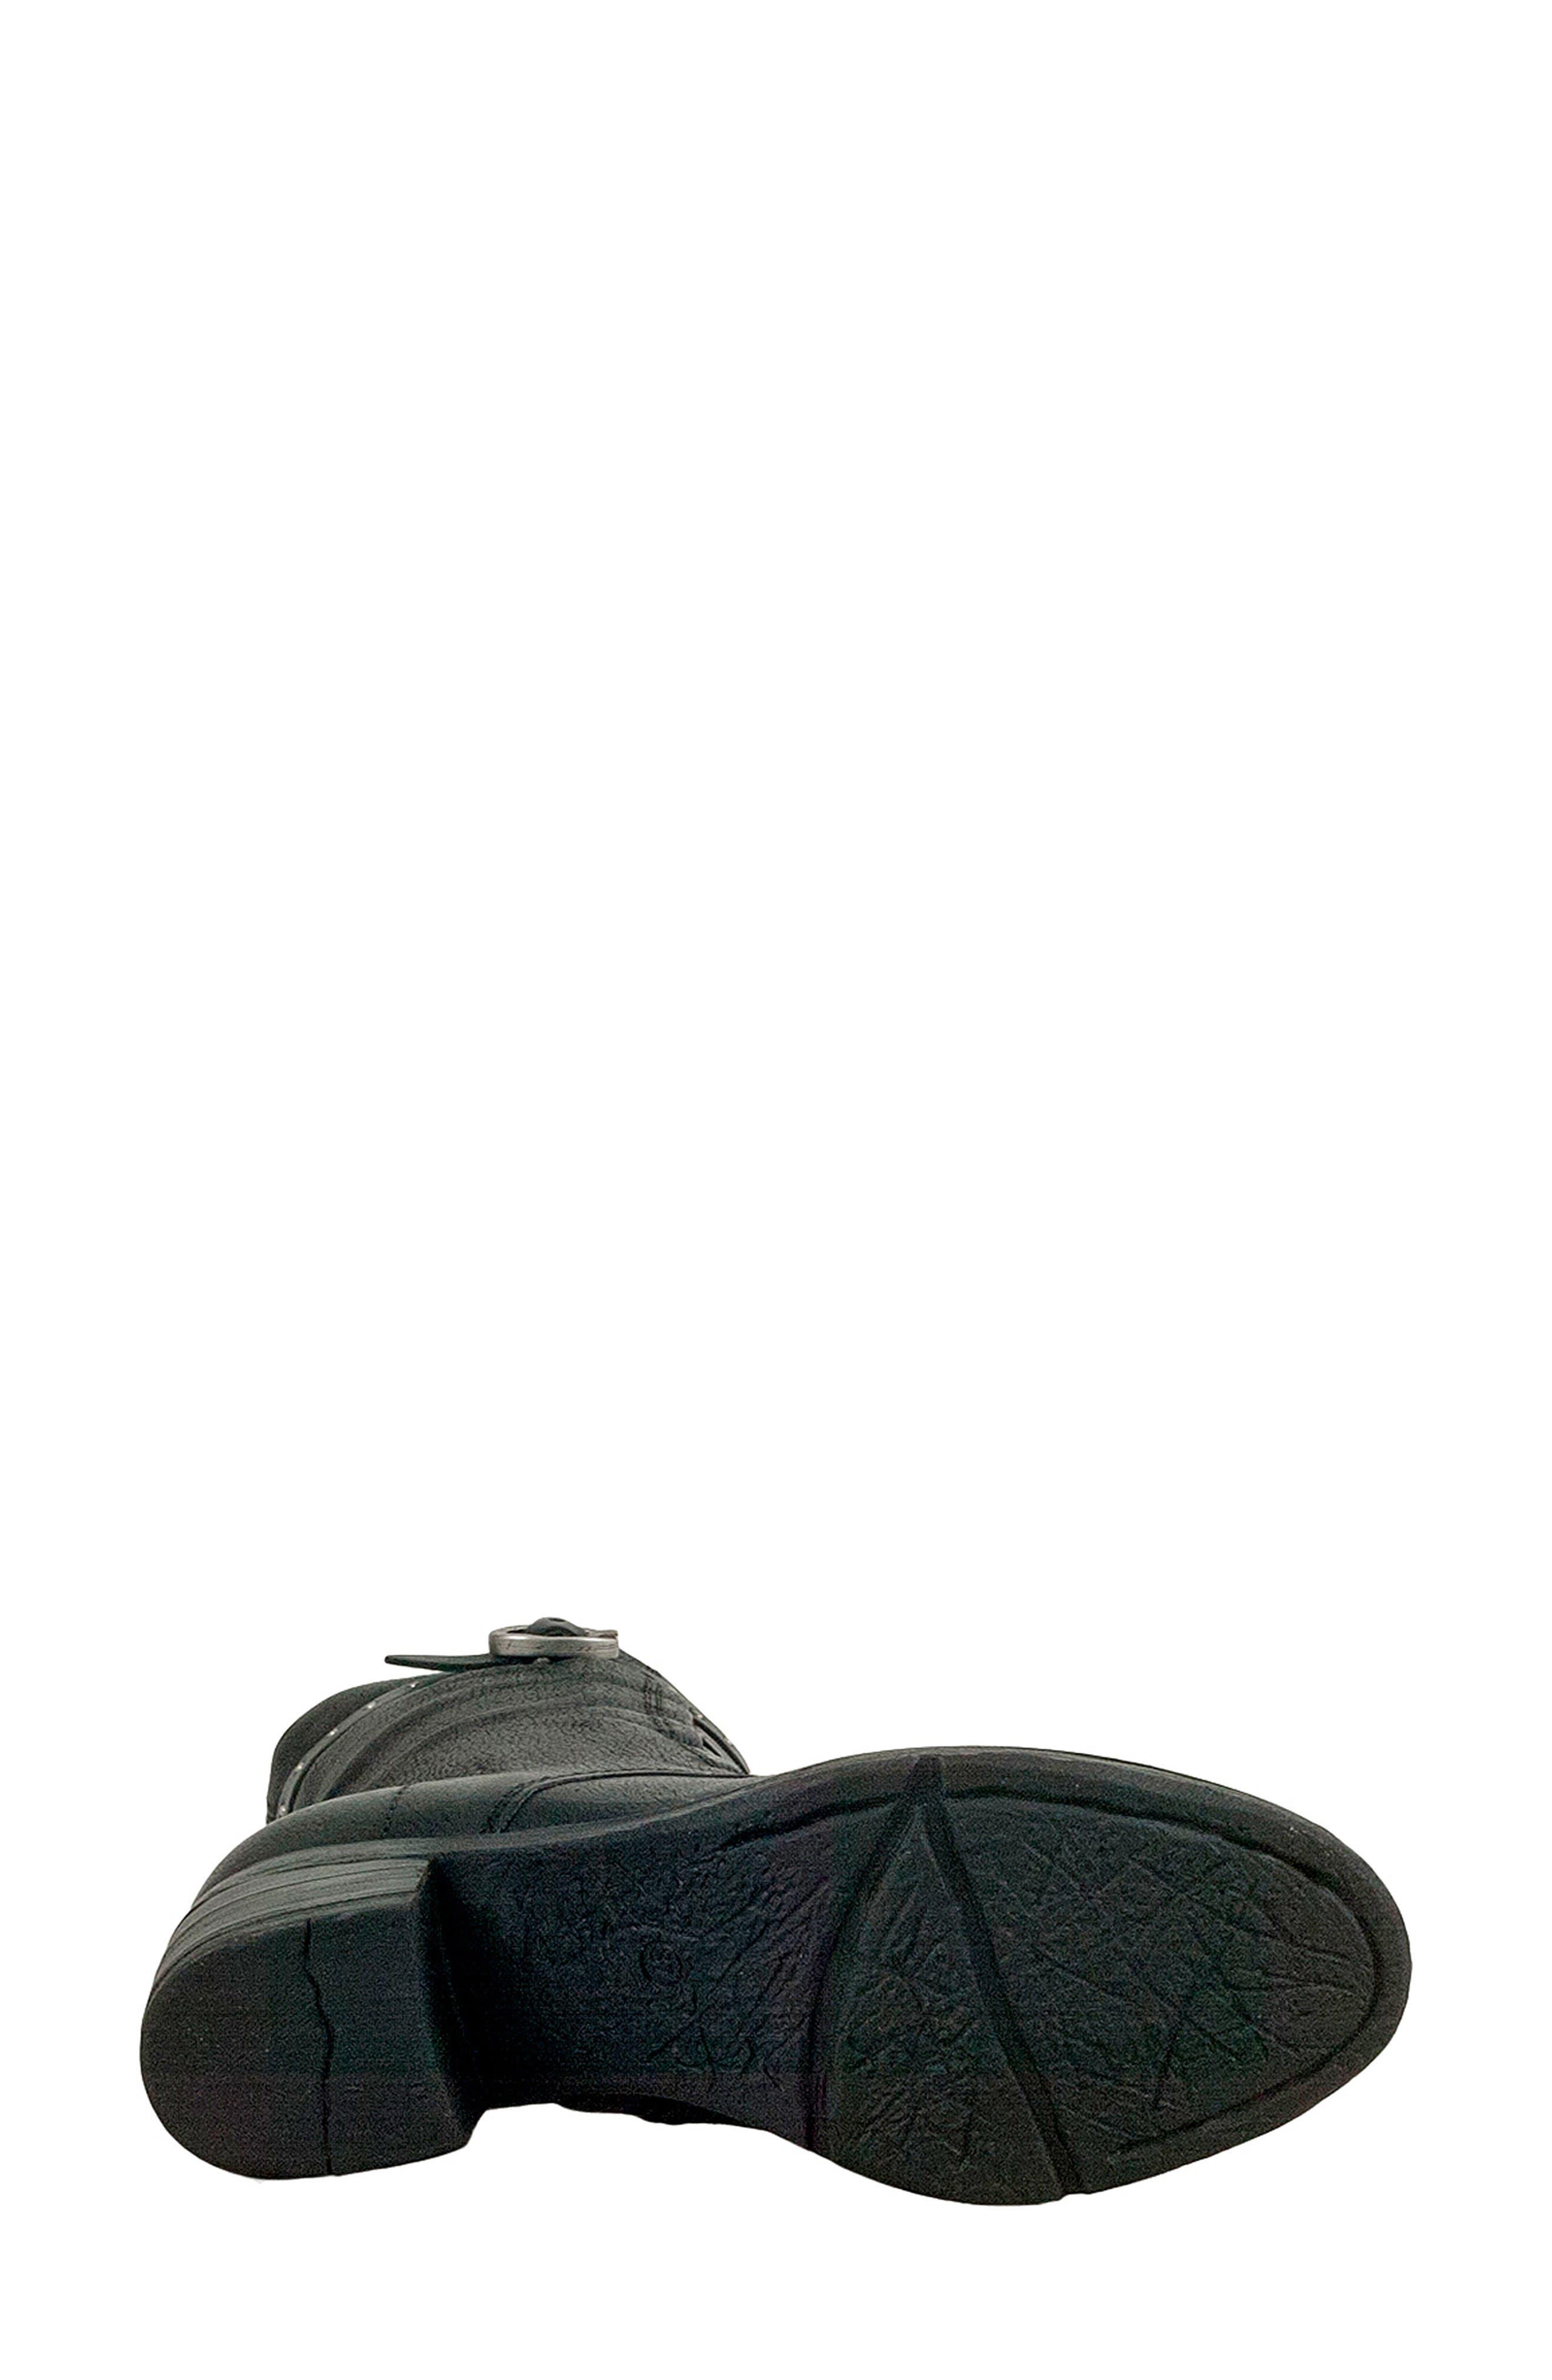 MIZ MOOZ, Suki Combat Boot, Alternate thumbnail 5, color, 001